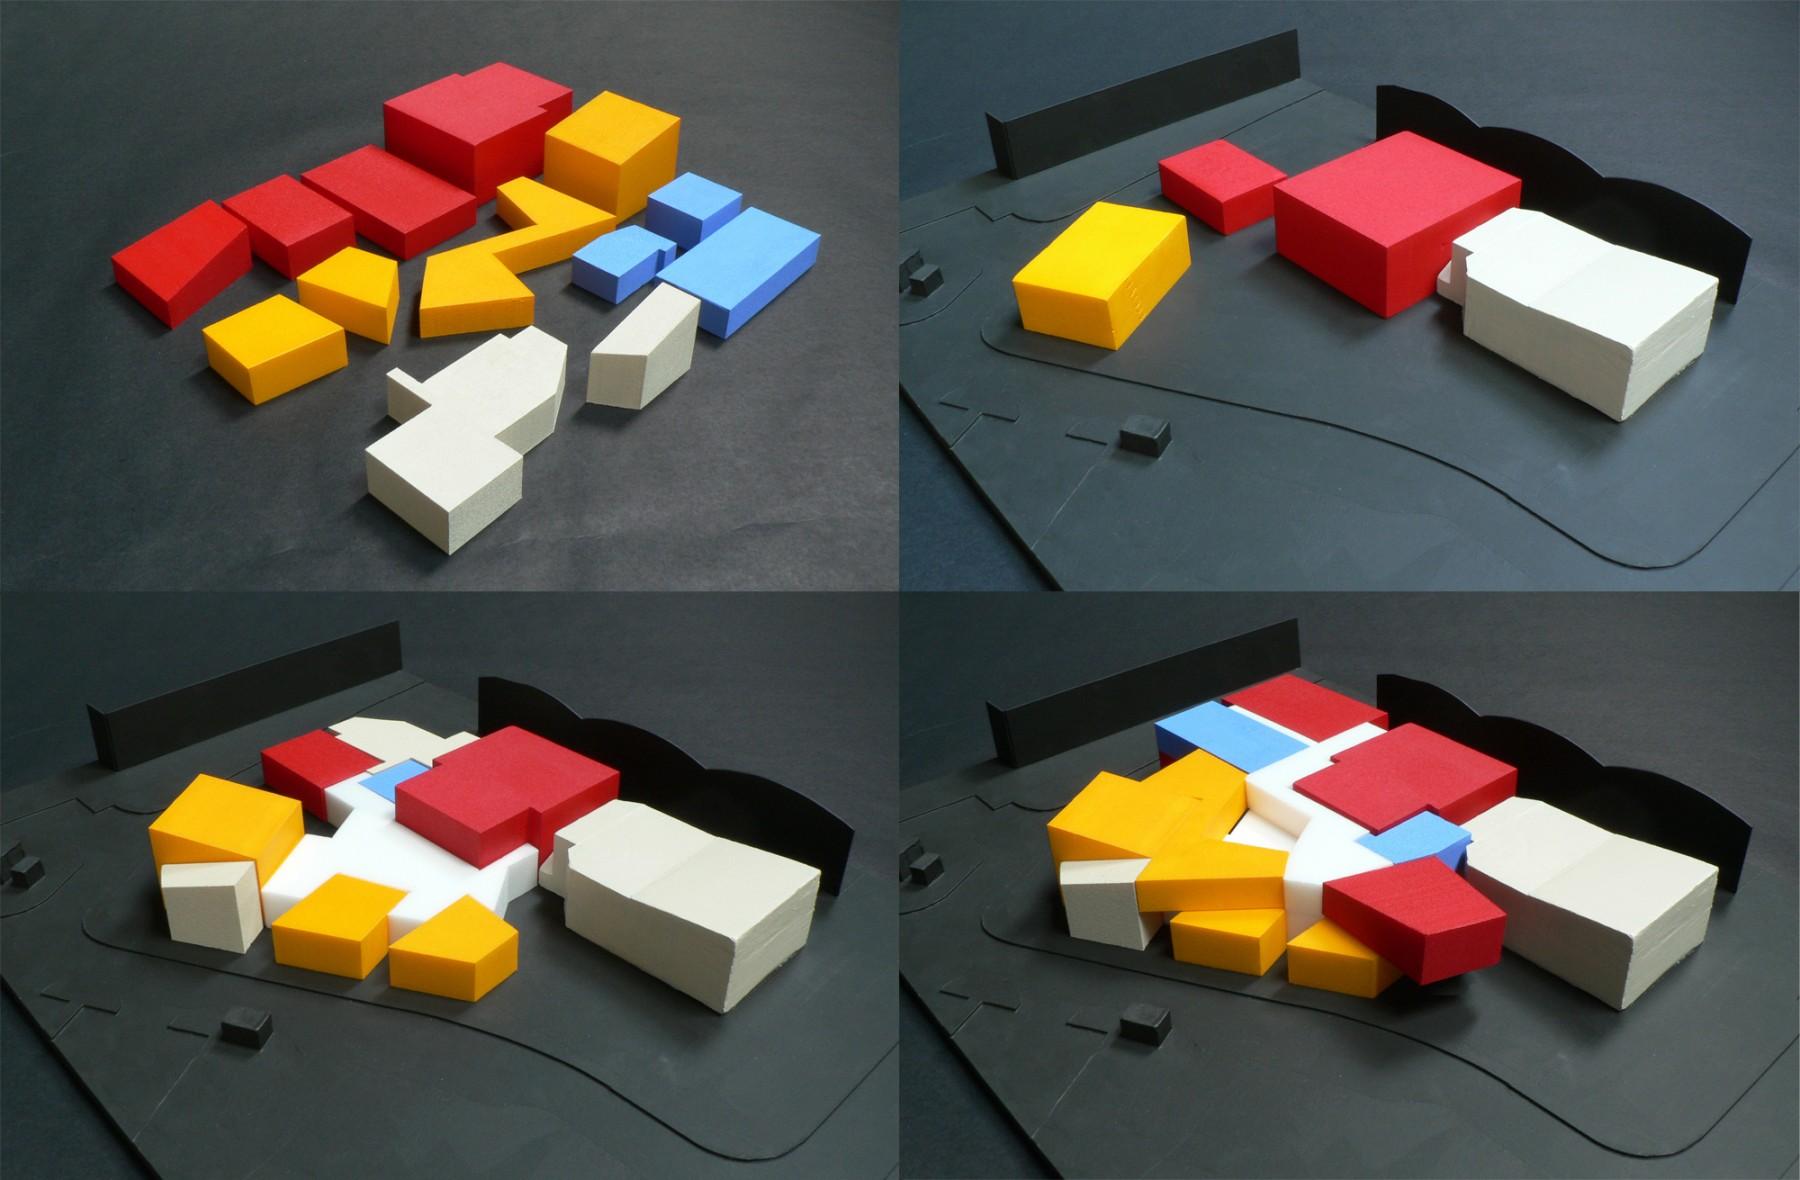 University-Bath-Creative-Arts-Centre-short-list-education-somerset-campus-theatre-Jamie-Fobert-architects-model-blocks